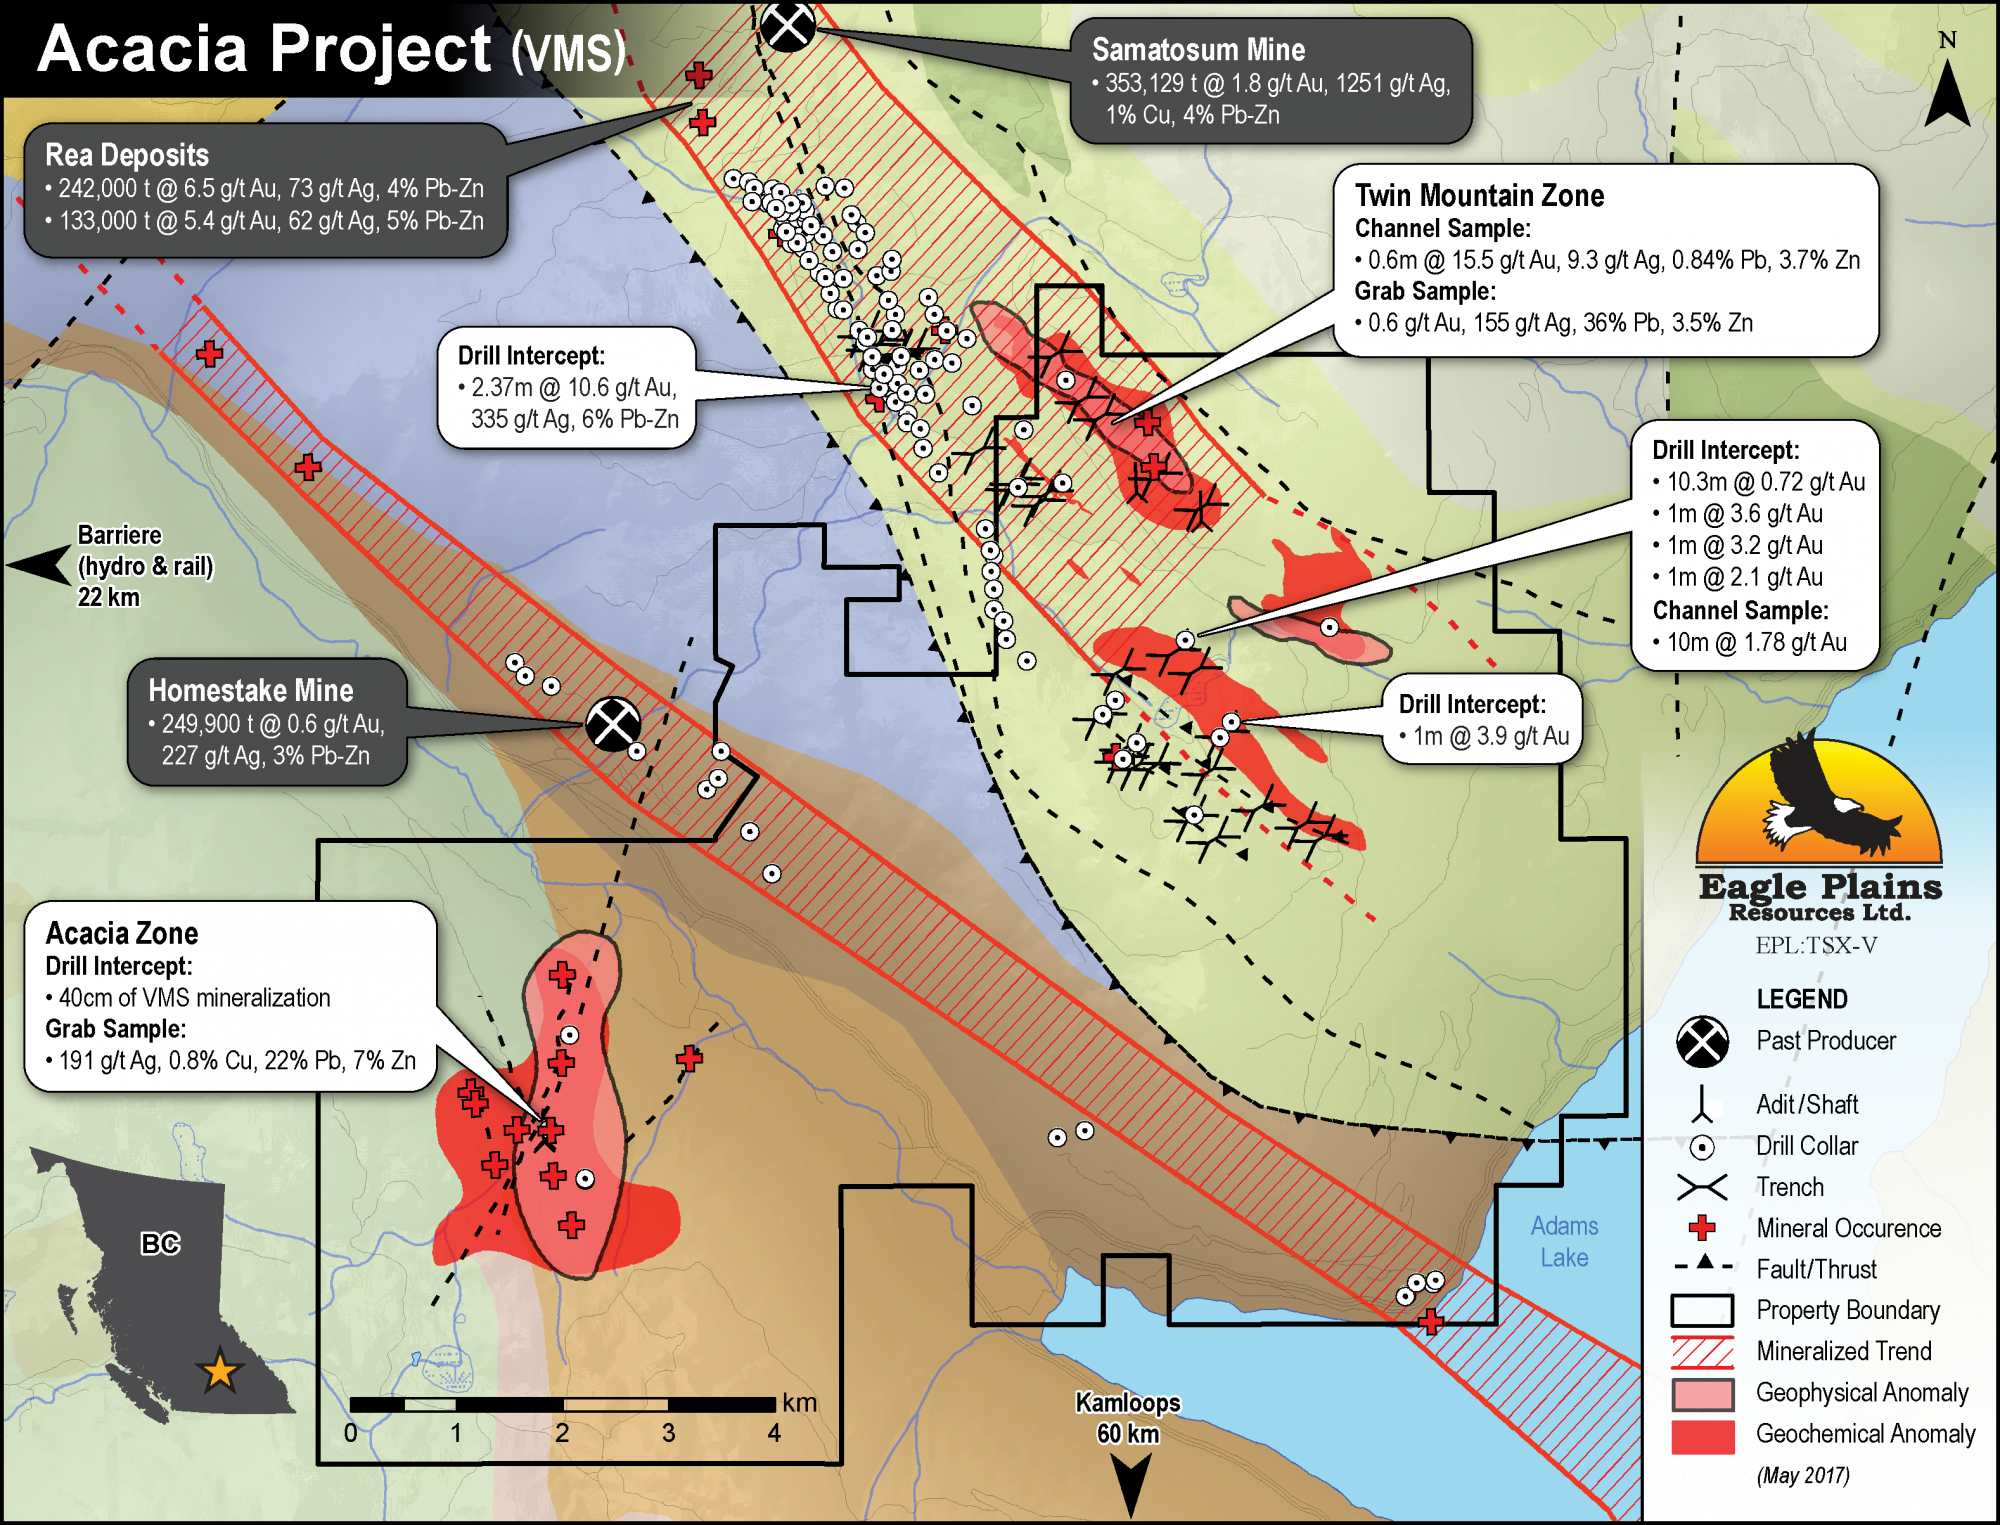 Eagle Plains - Acacia Project - Volcanic Massive Sulphide